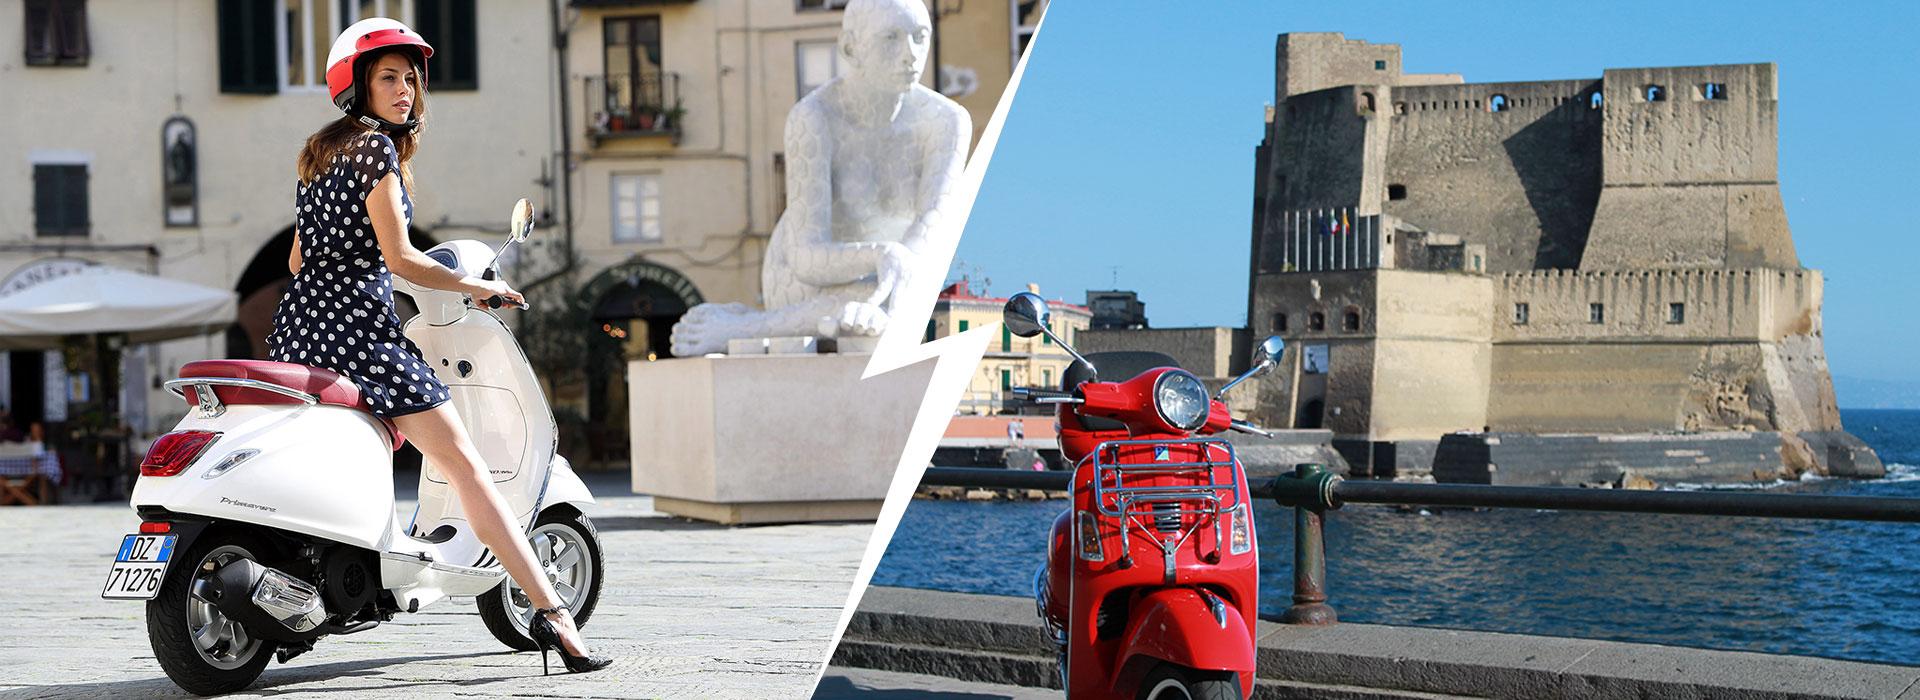 Noleggio Scooter Vespa Napoli